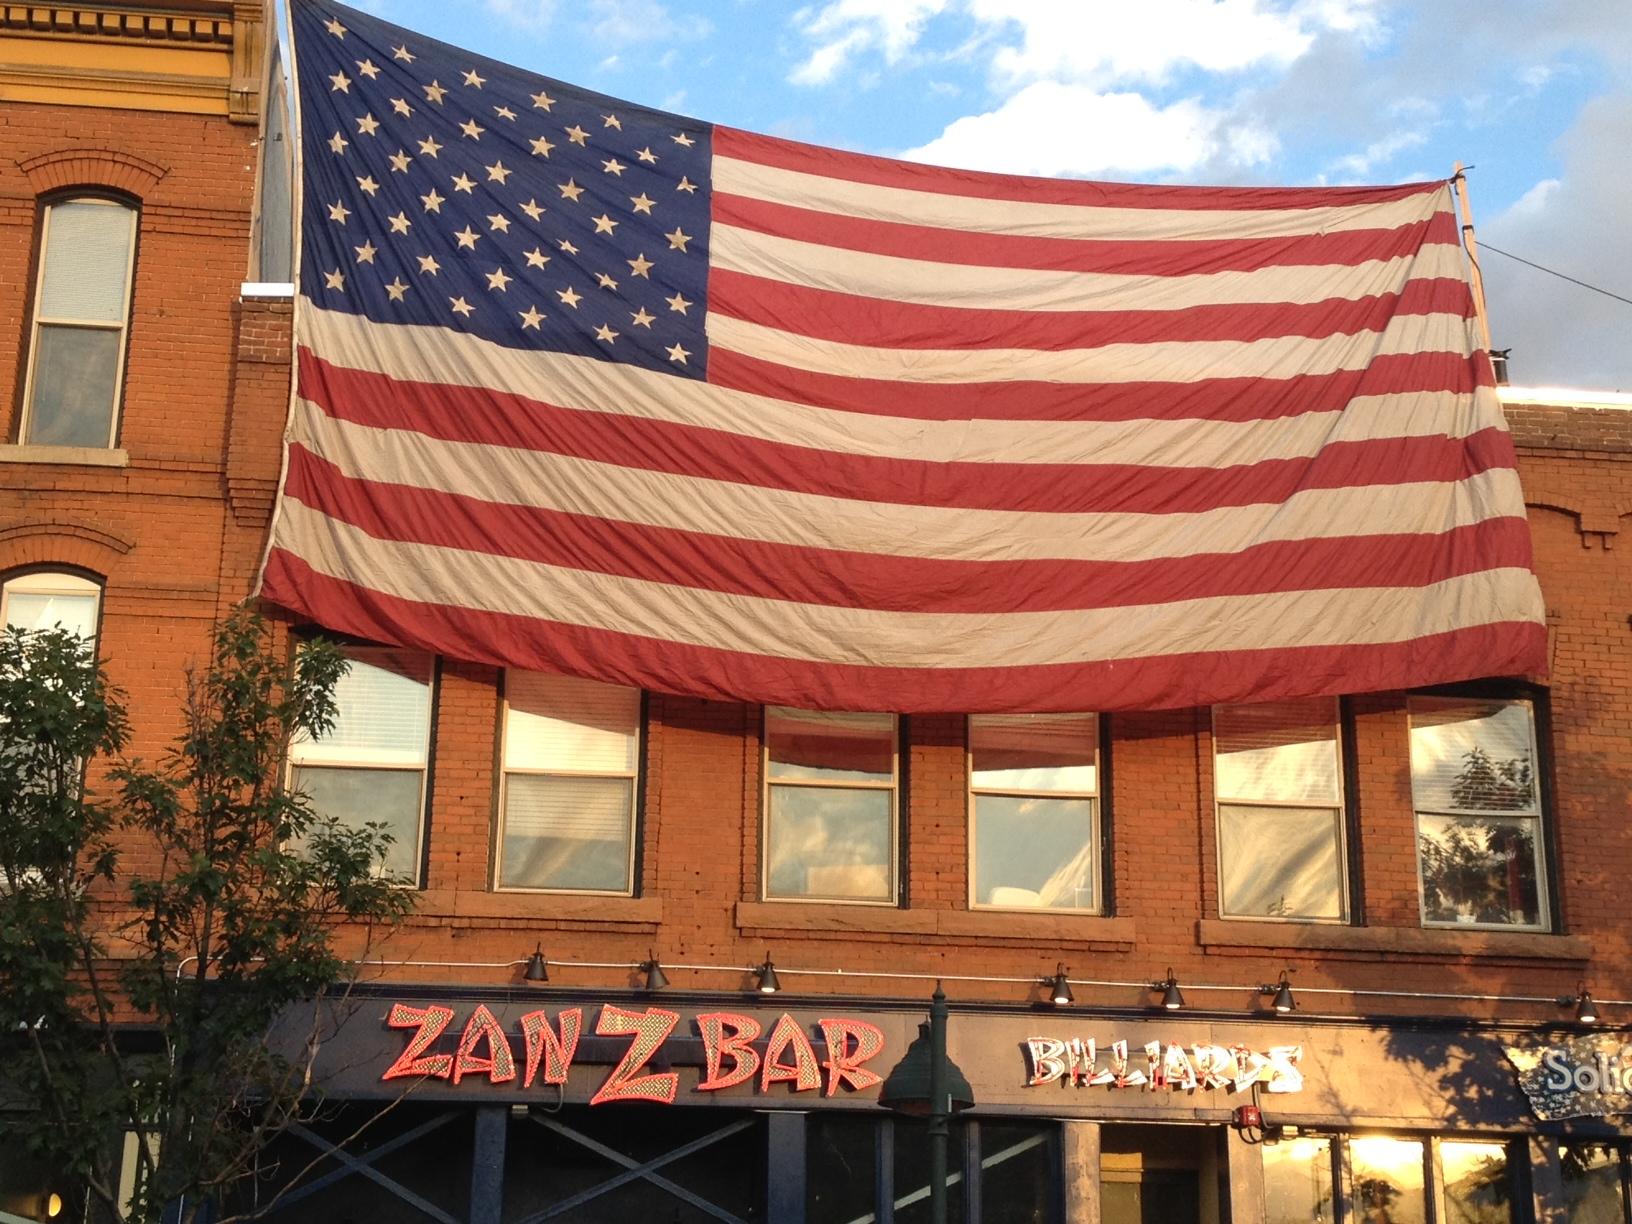 Zanzibar Billiards Bar & Grill